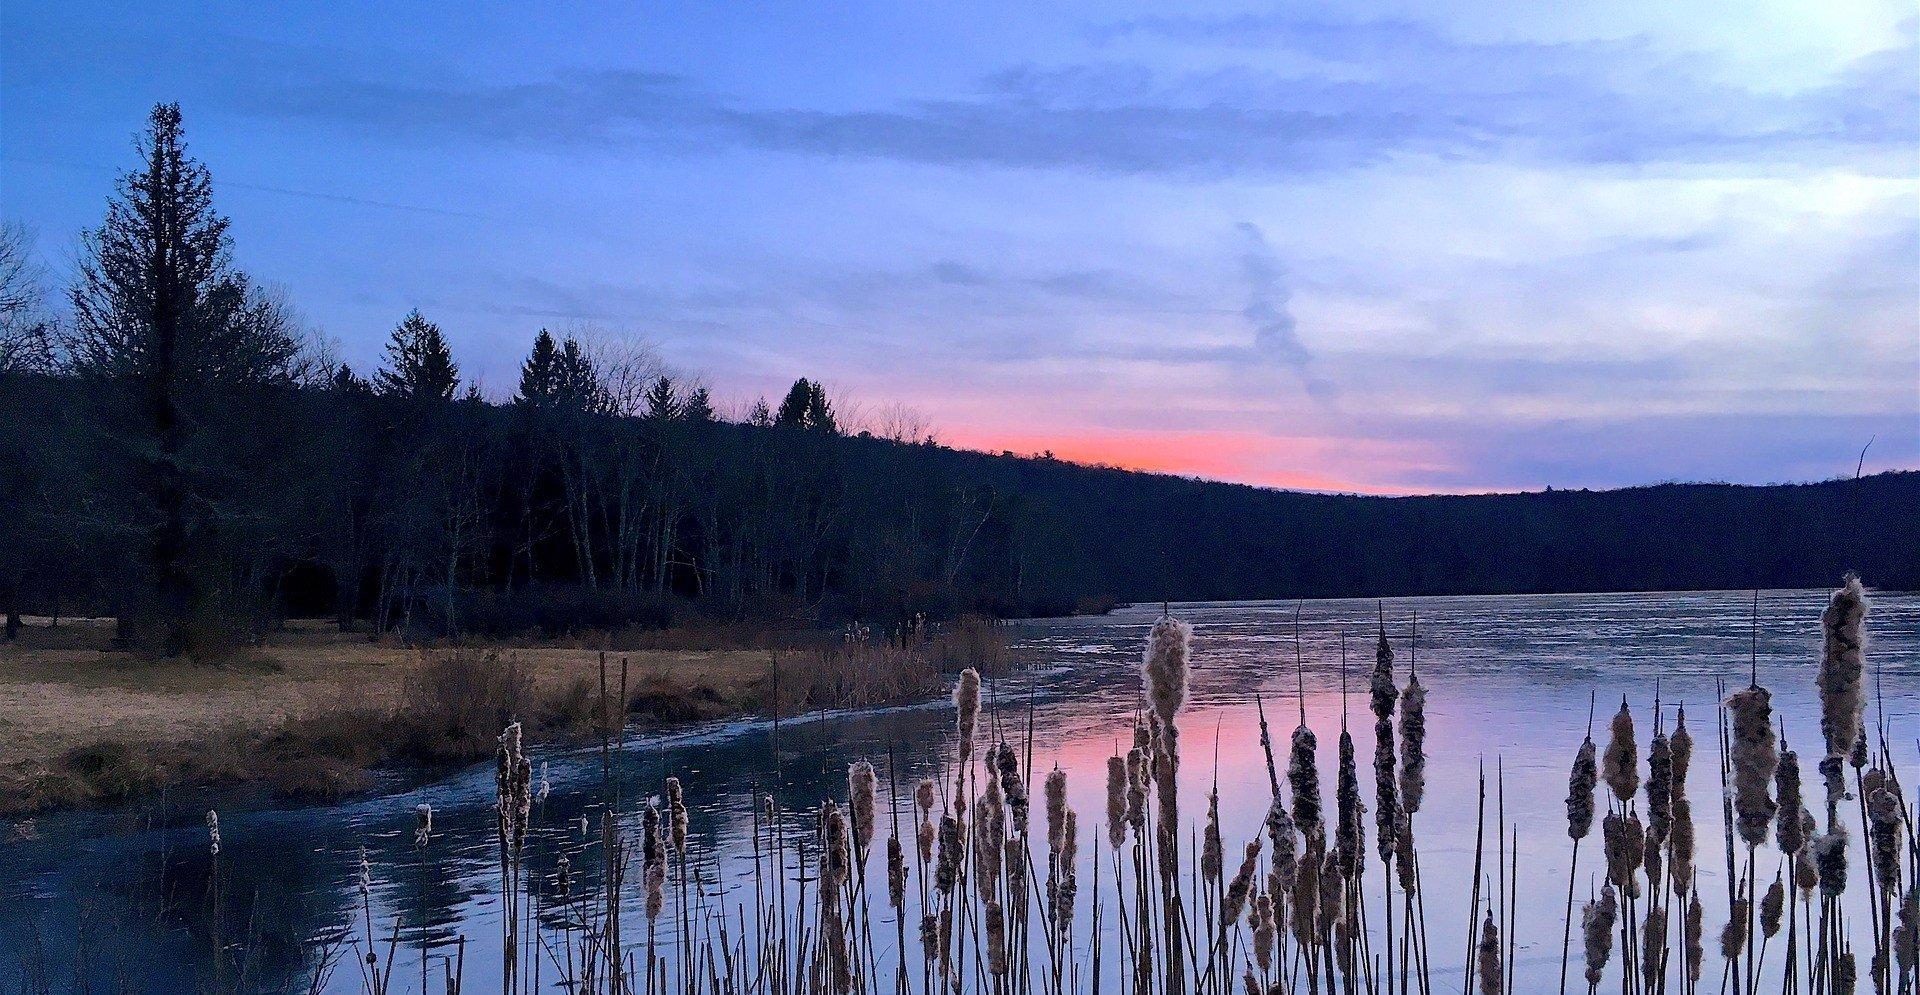 Sunset in Medford Lakes, New Jersey - VeteranCarDonations.org